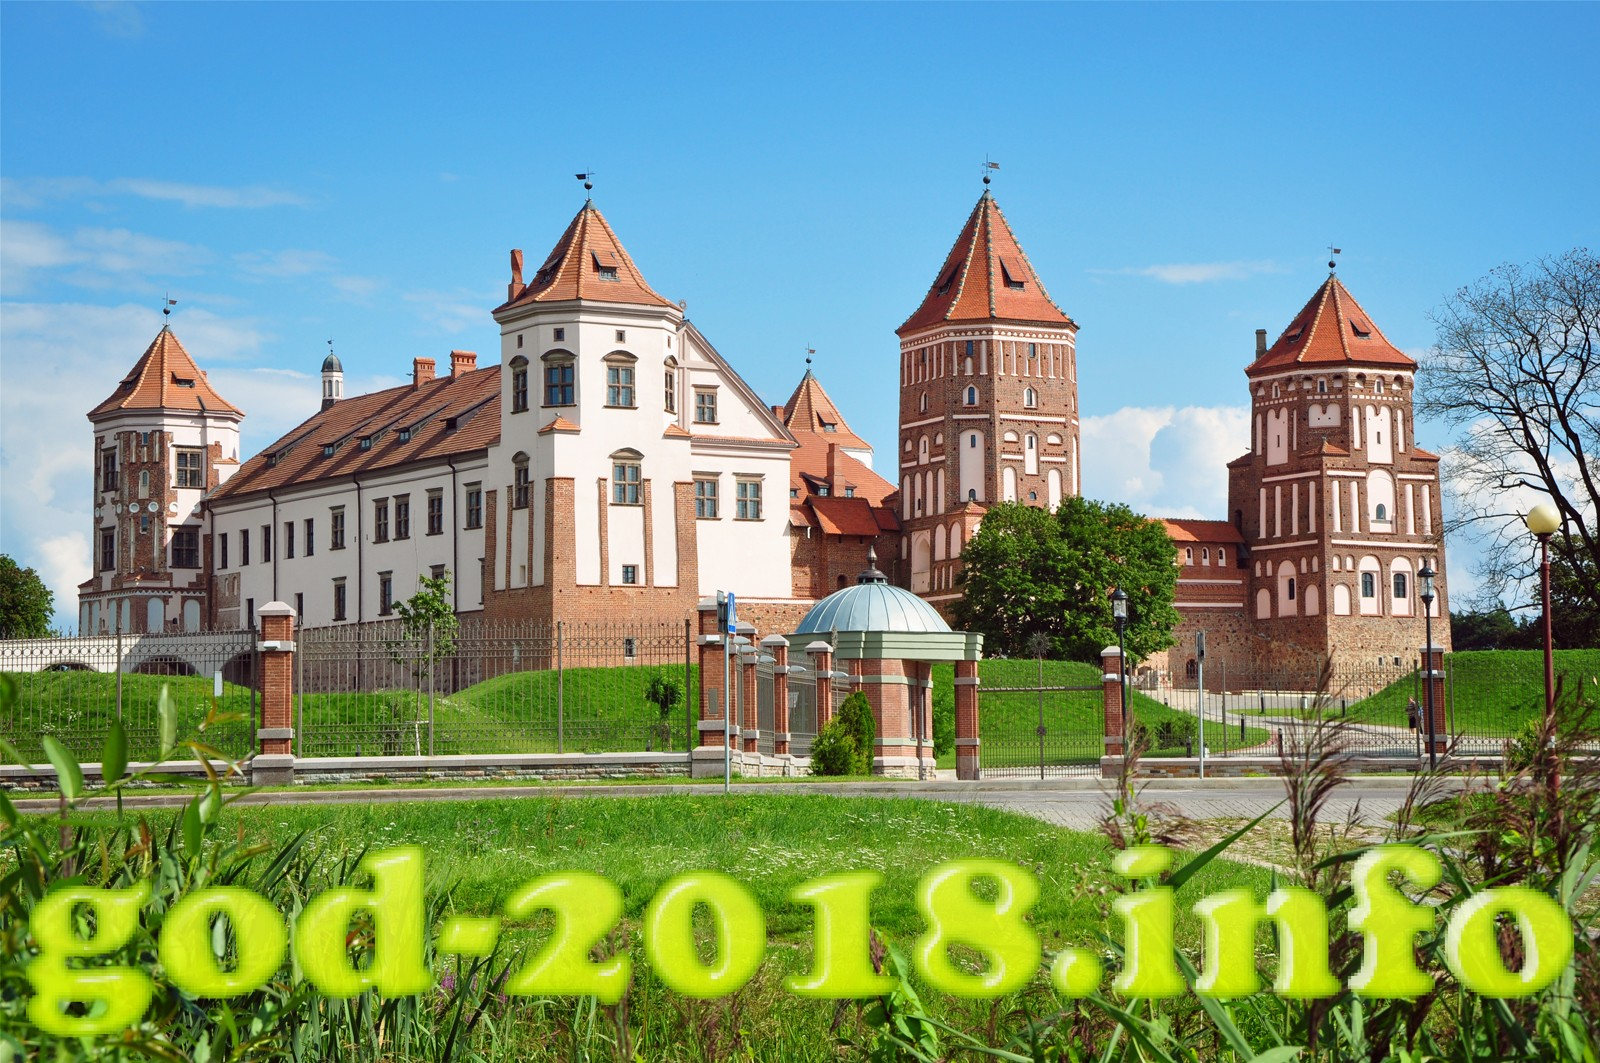 novyj-god-2018-v-belorussii-kuda-shodit-5